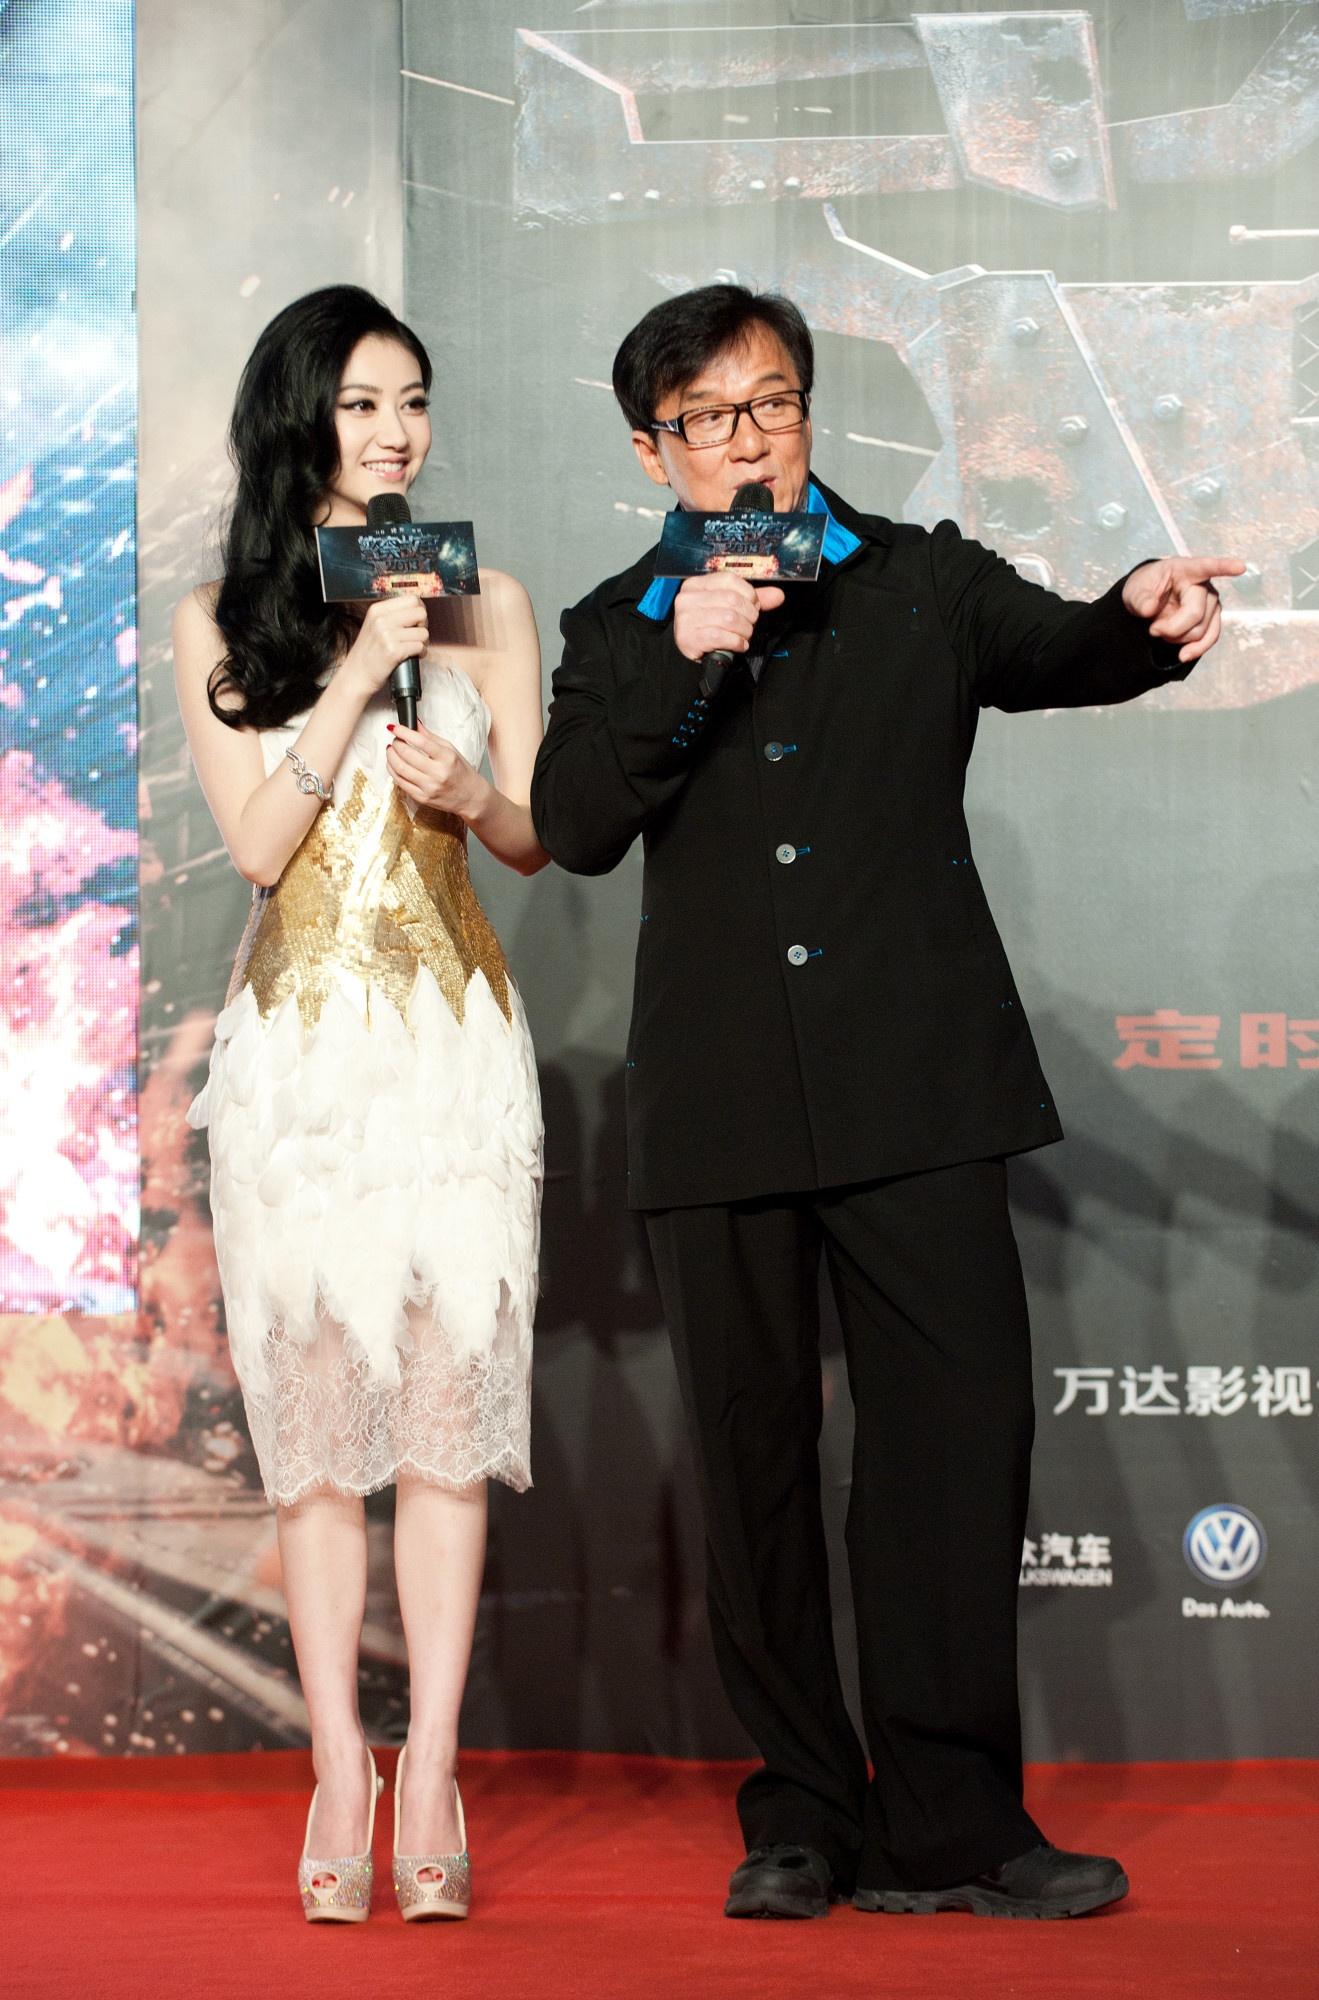 Full Movie 警察故事2013 High Quality